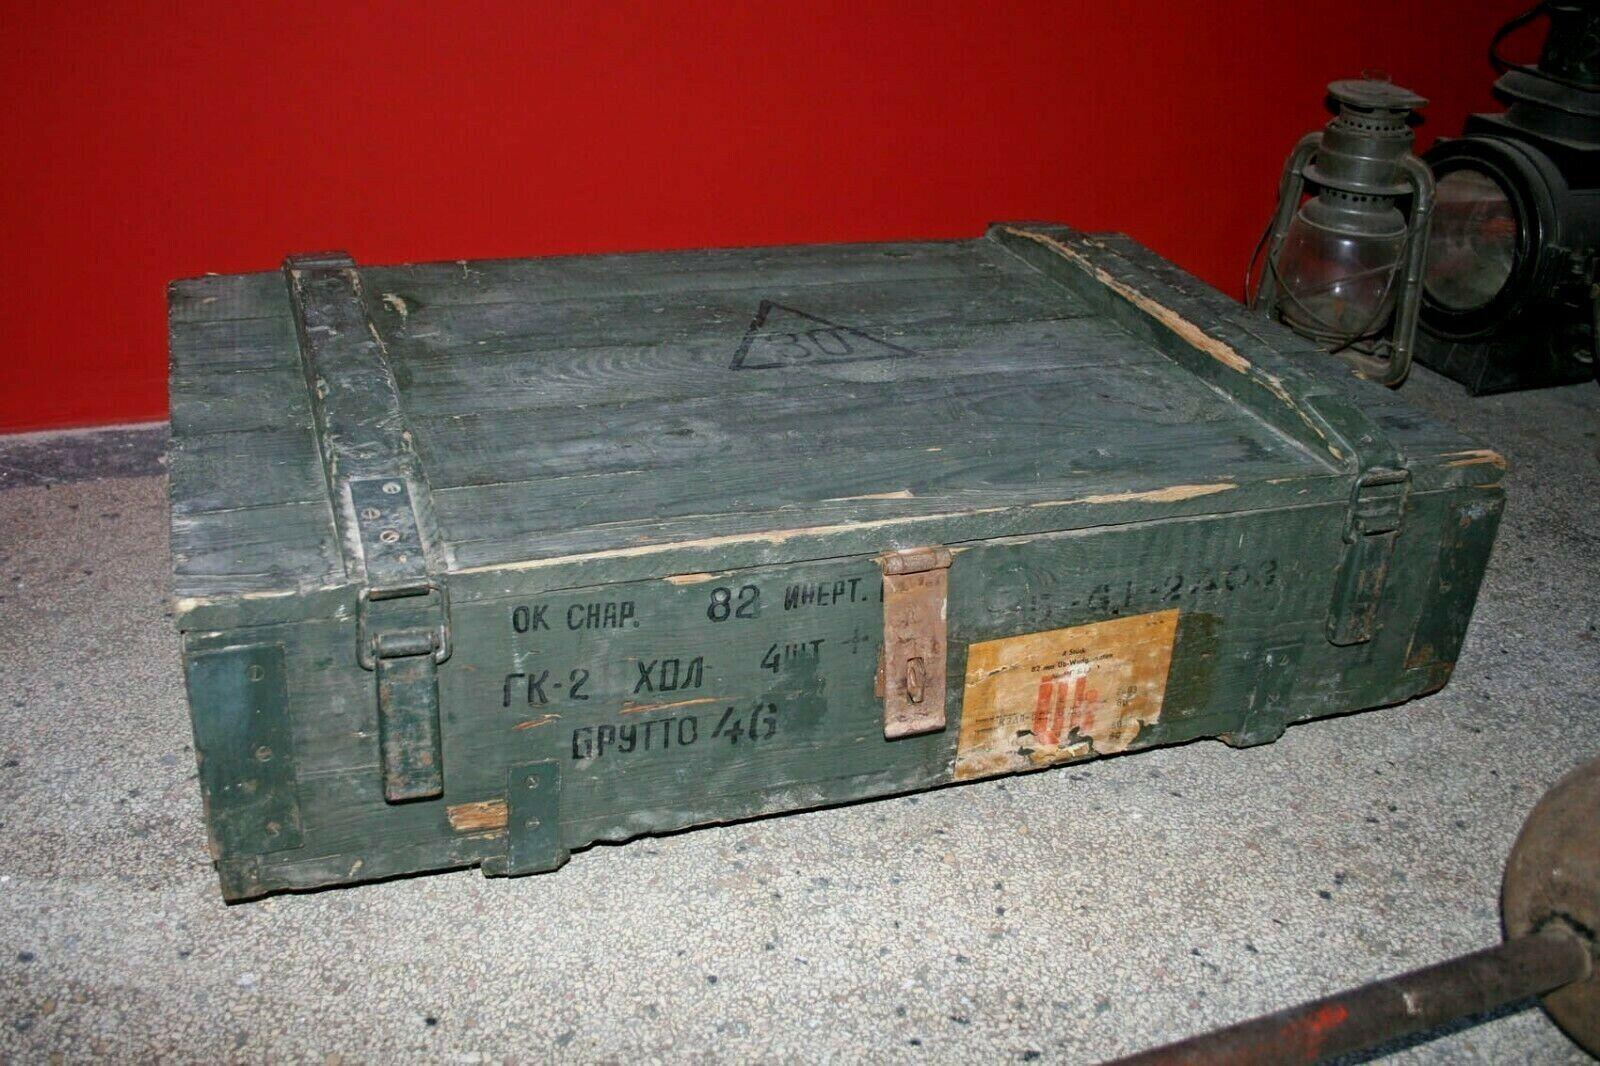 NVA DDR Munitionskiste Transportkiste Militär Kiste Truhe Tisch 85x52x24cm